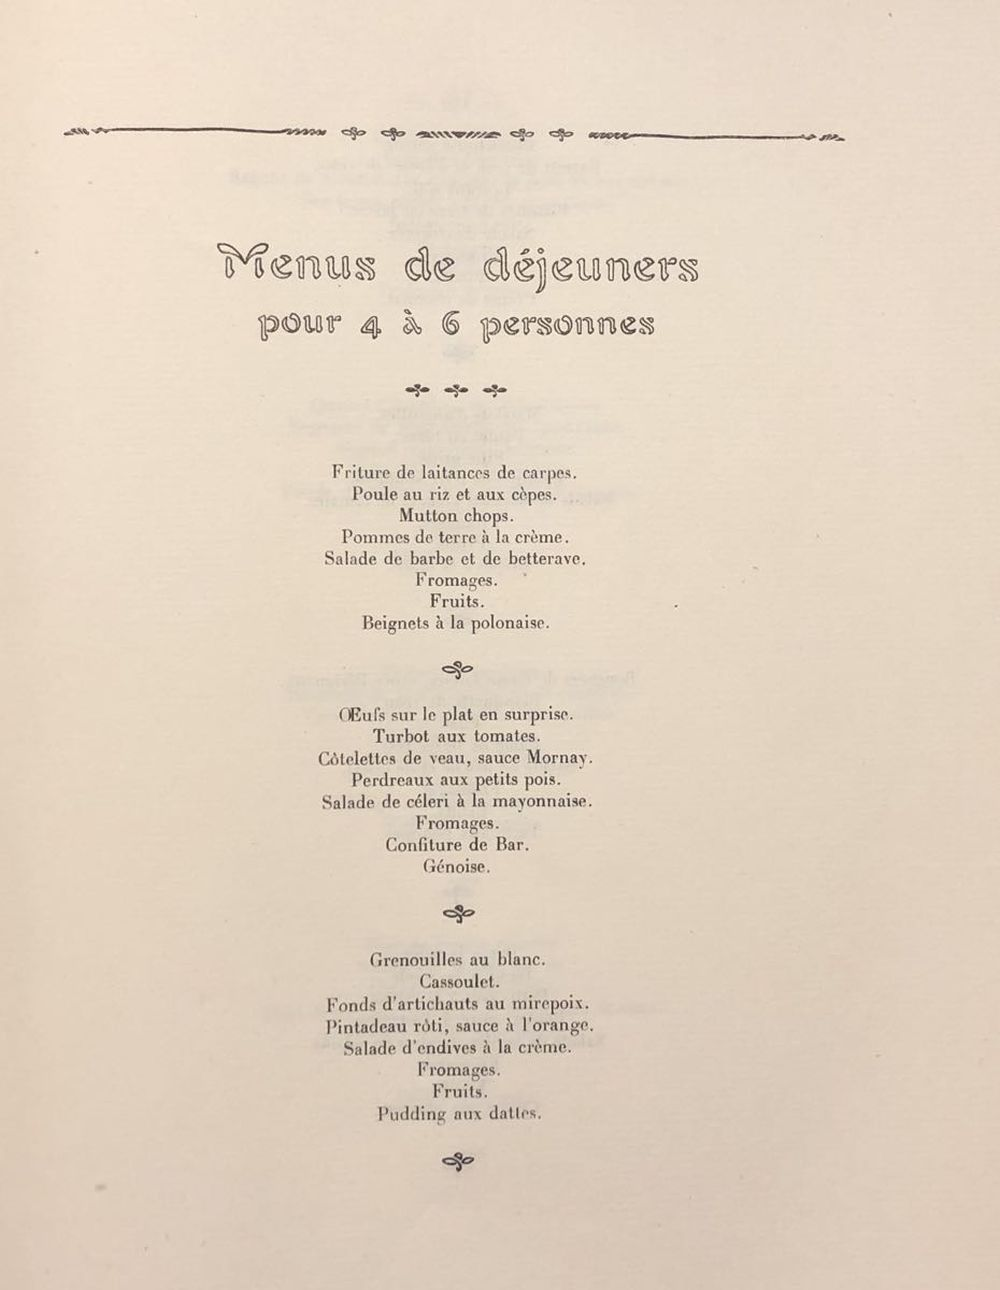 [GASTRONOMIE] ALI-BAB pseudonyme de Henri BABINSKI - Ga